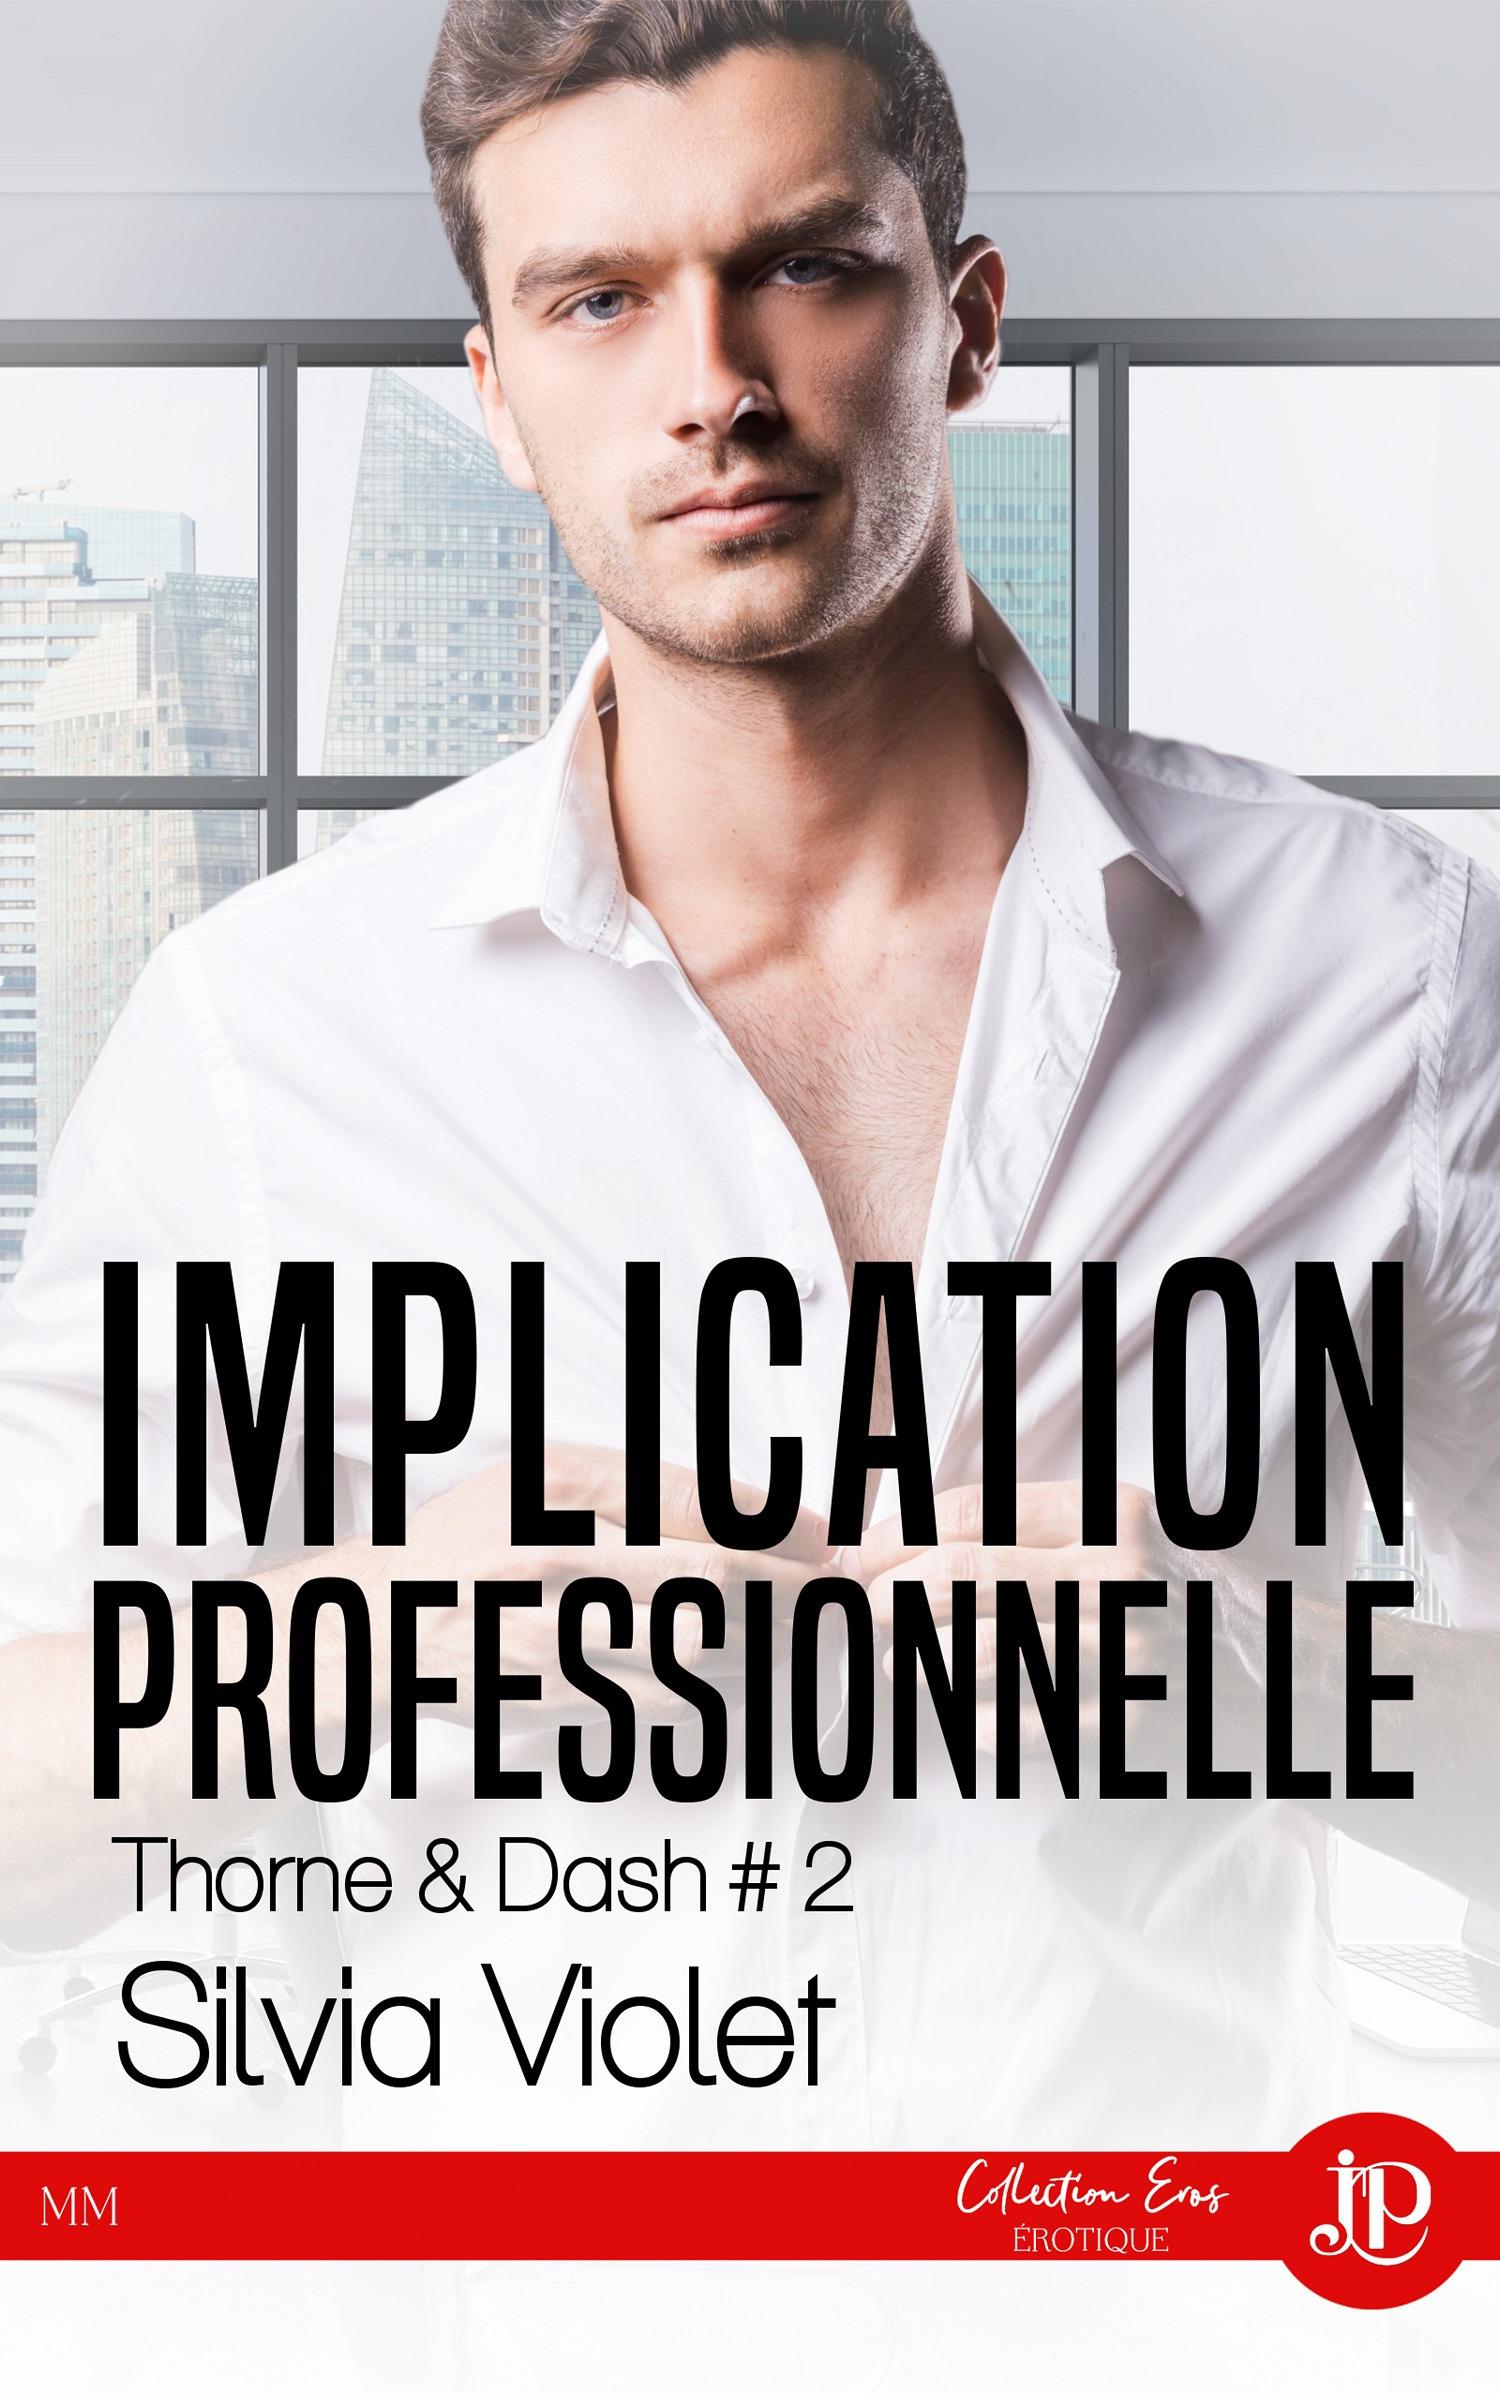 Thorne & dash - t02 - implication personnelle - thorne & dash #2